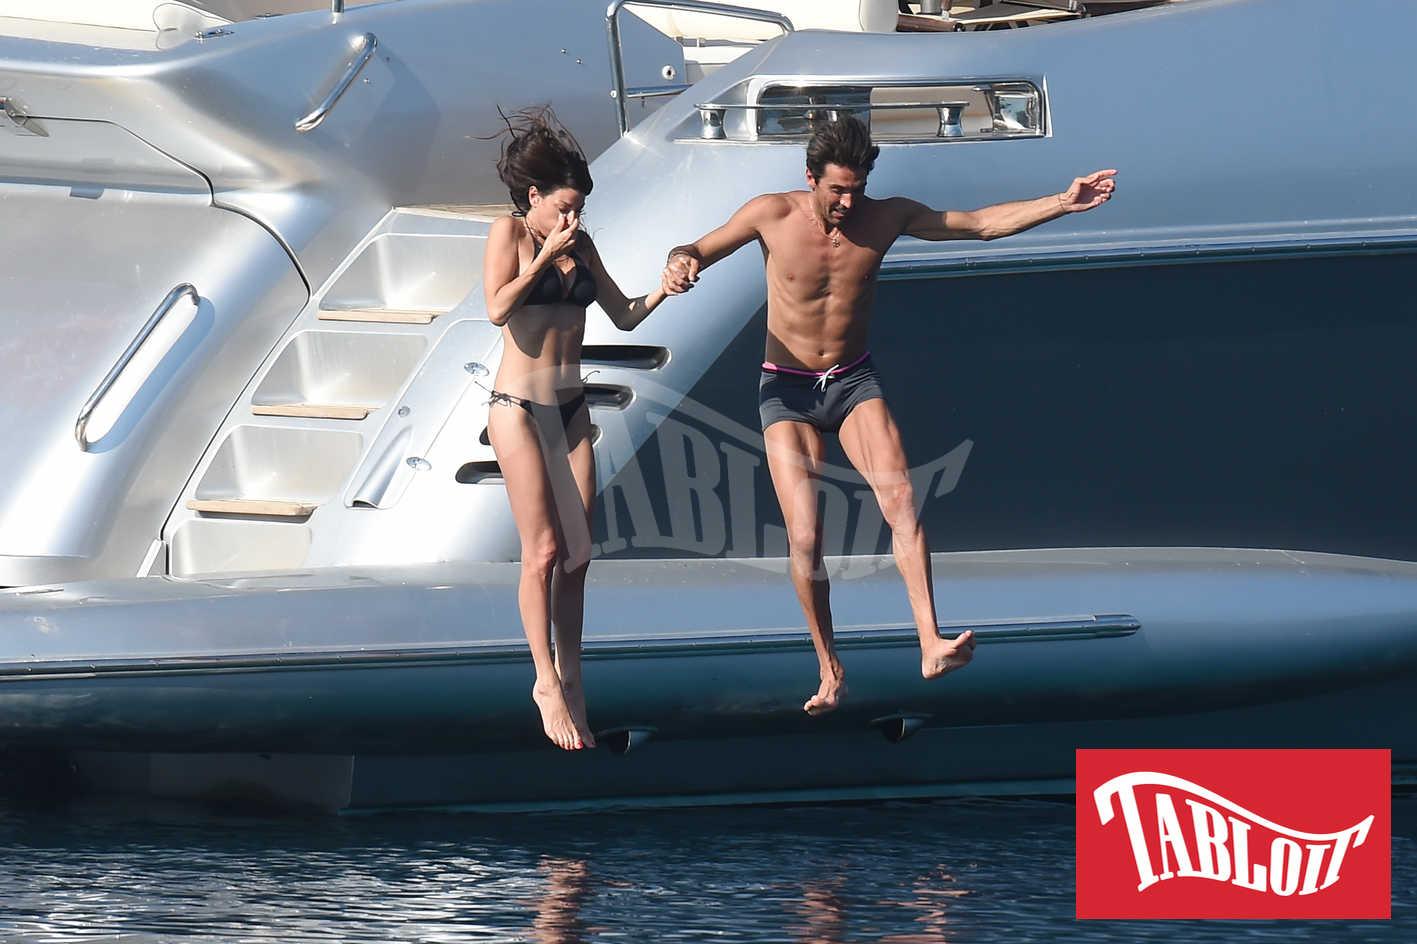 Gianluigi Buffon e Ilaria D'amico durante una vacanza in Grecia in yacht